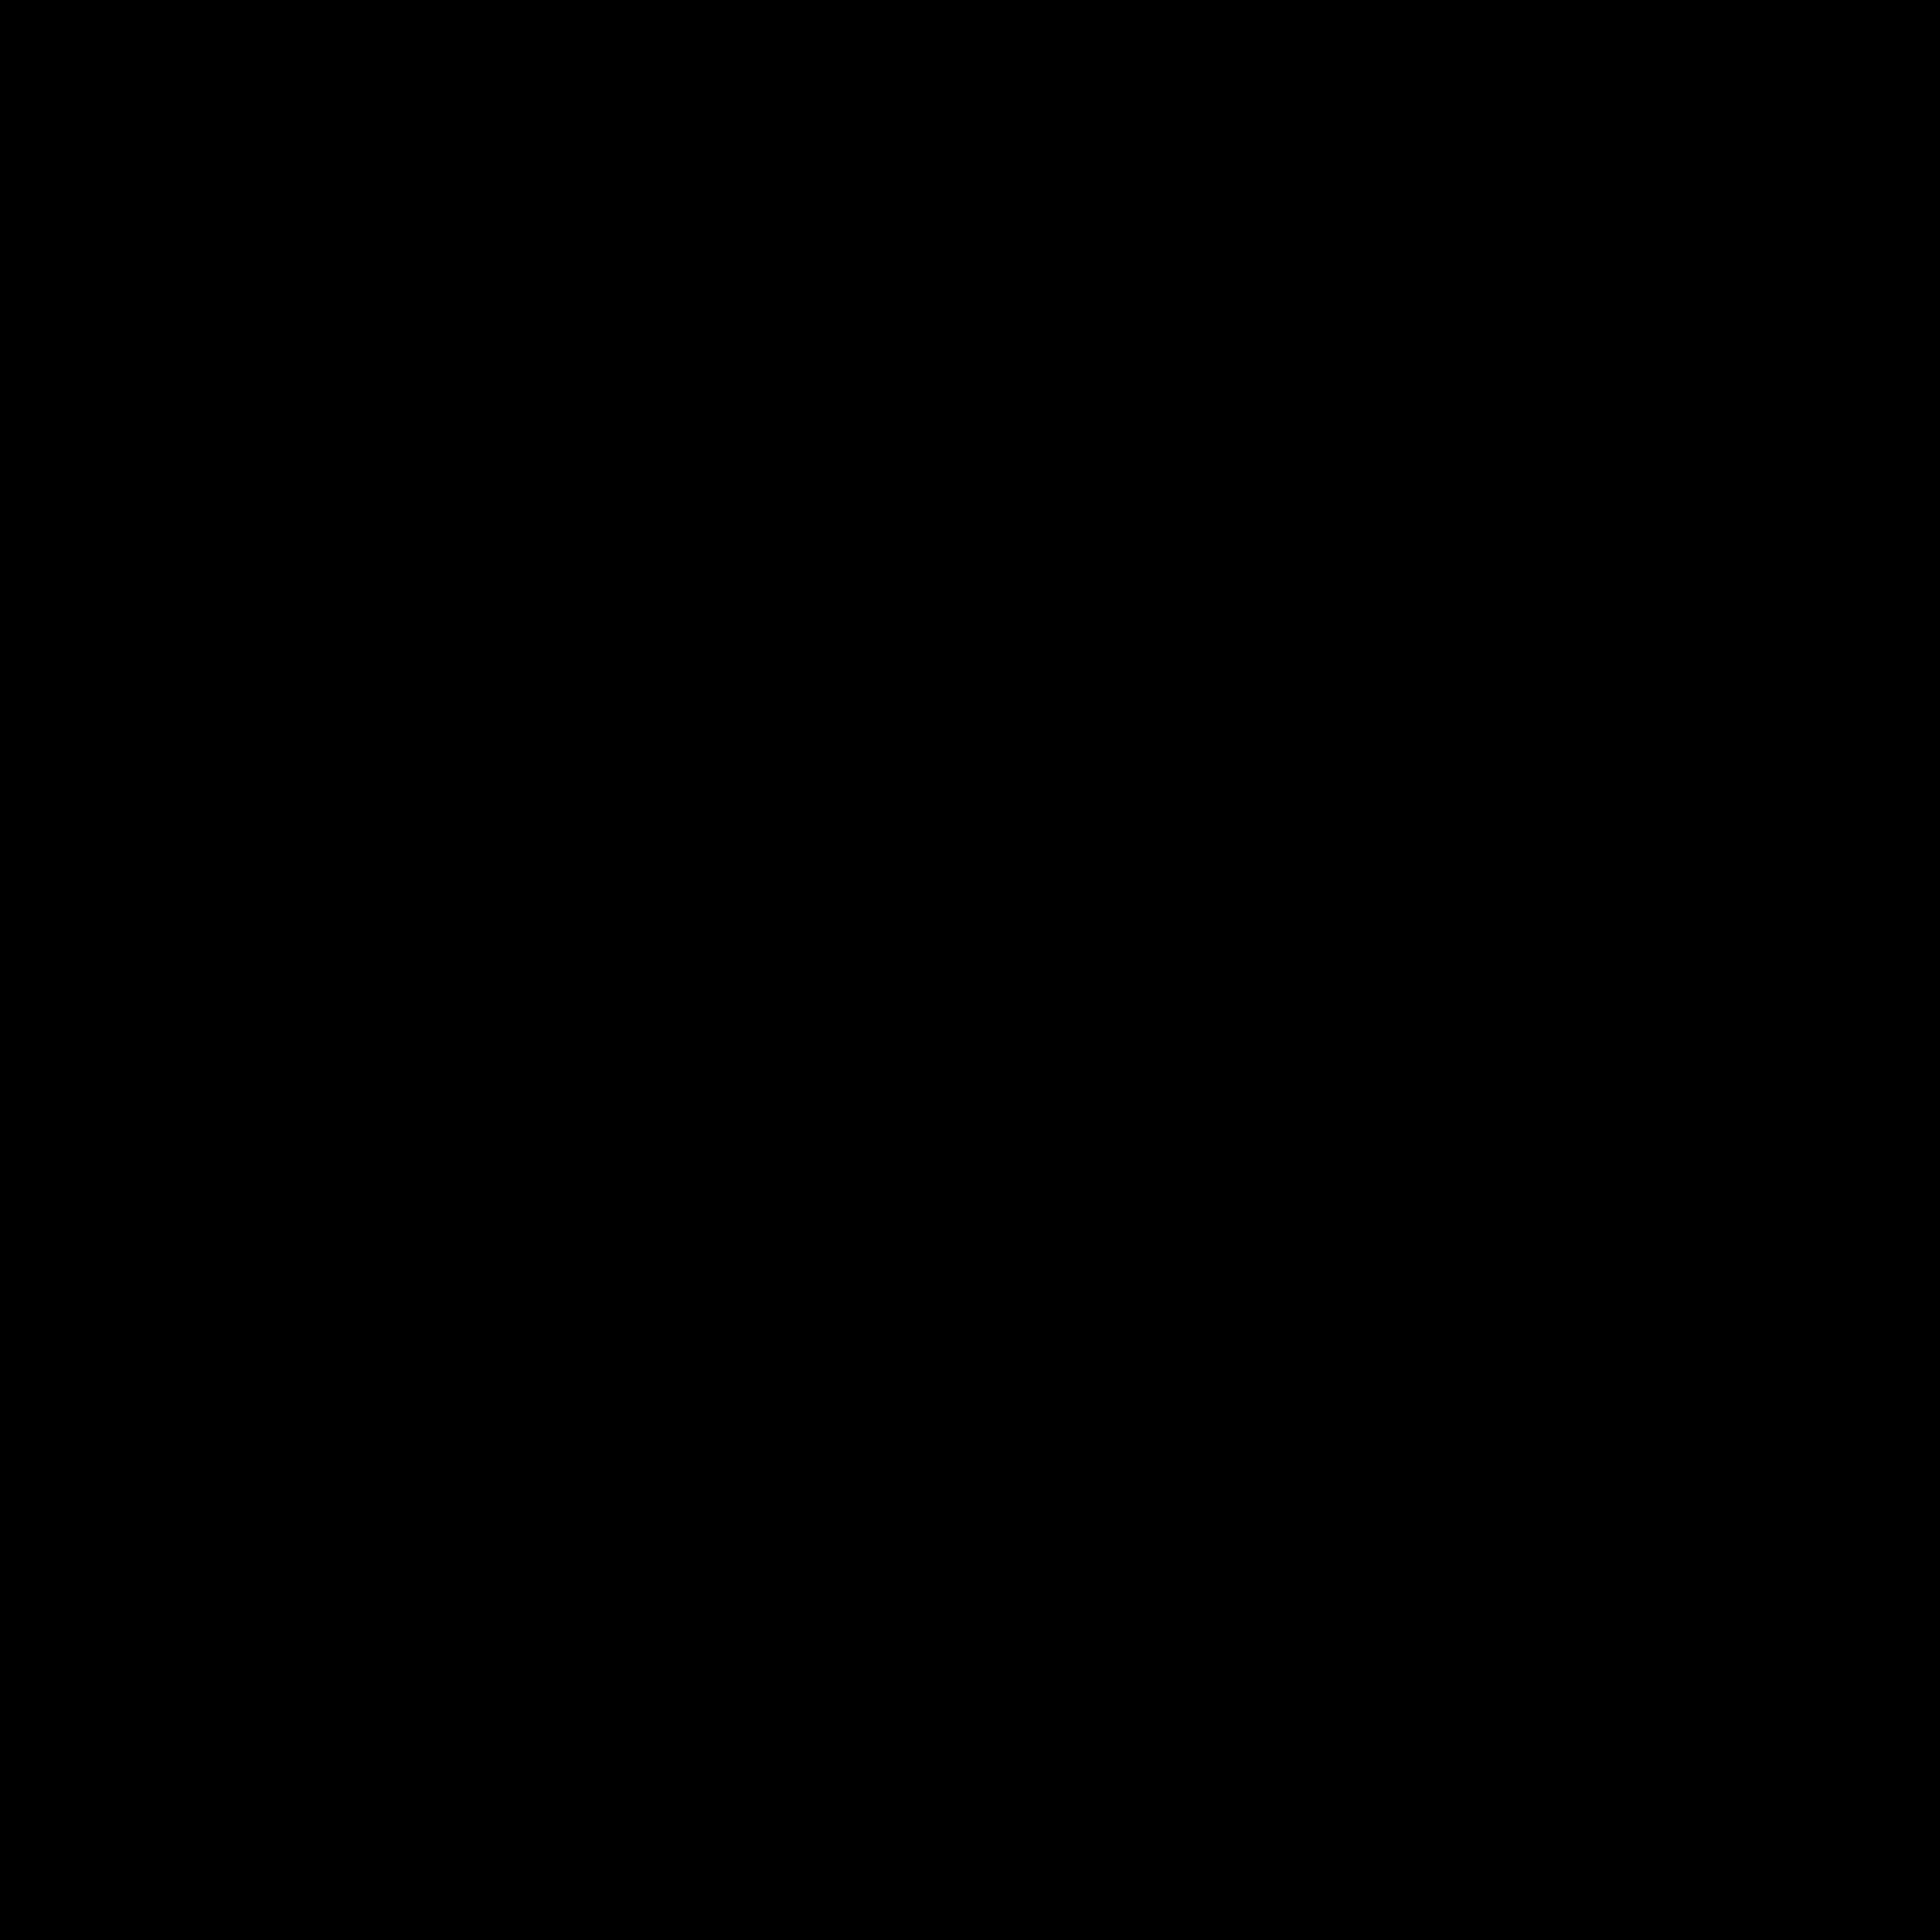 Hamburger icon png. File svg wikimedia commons